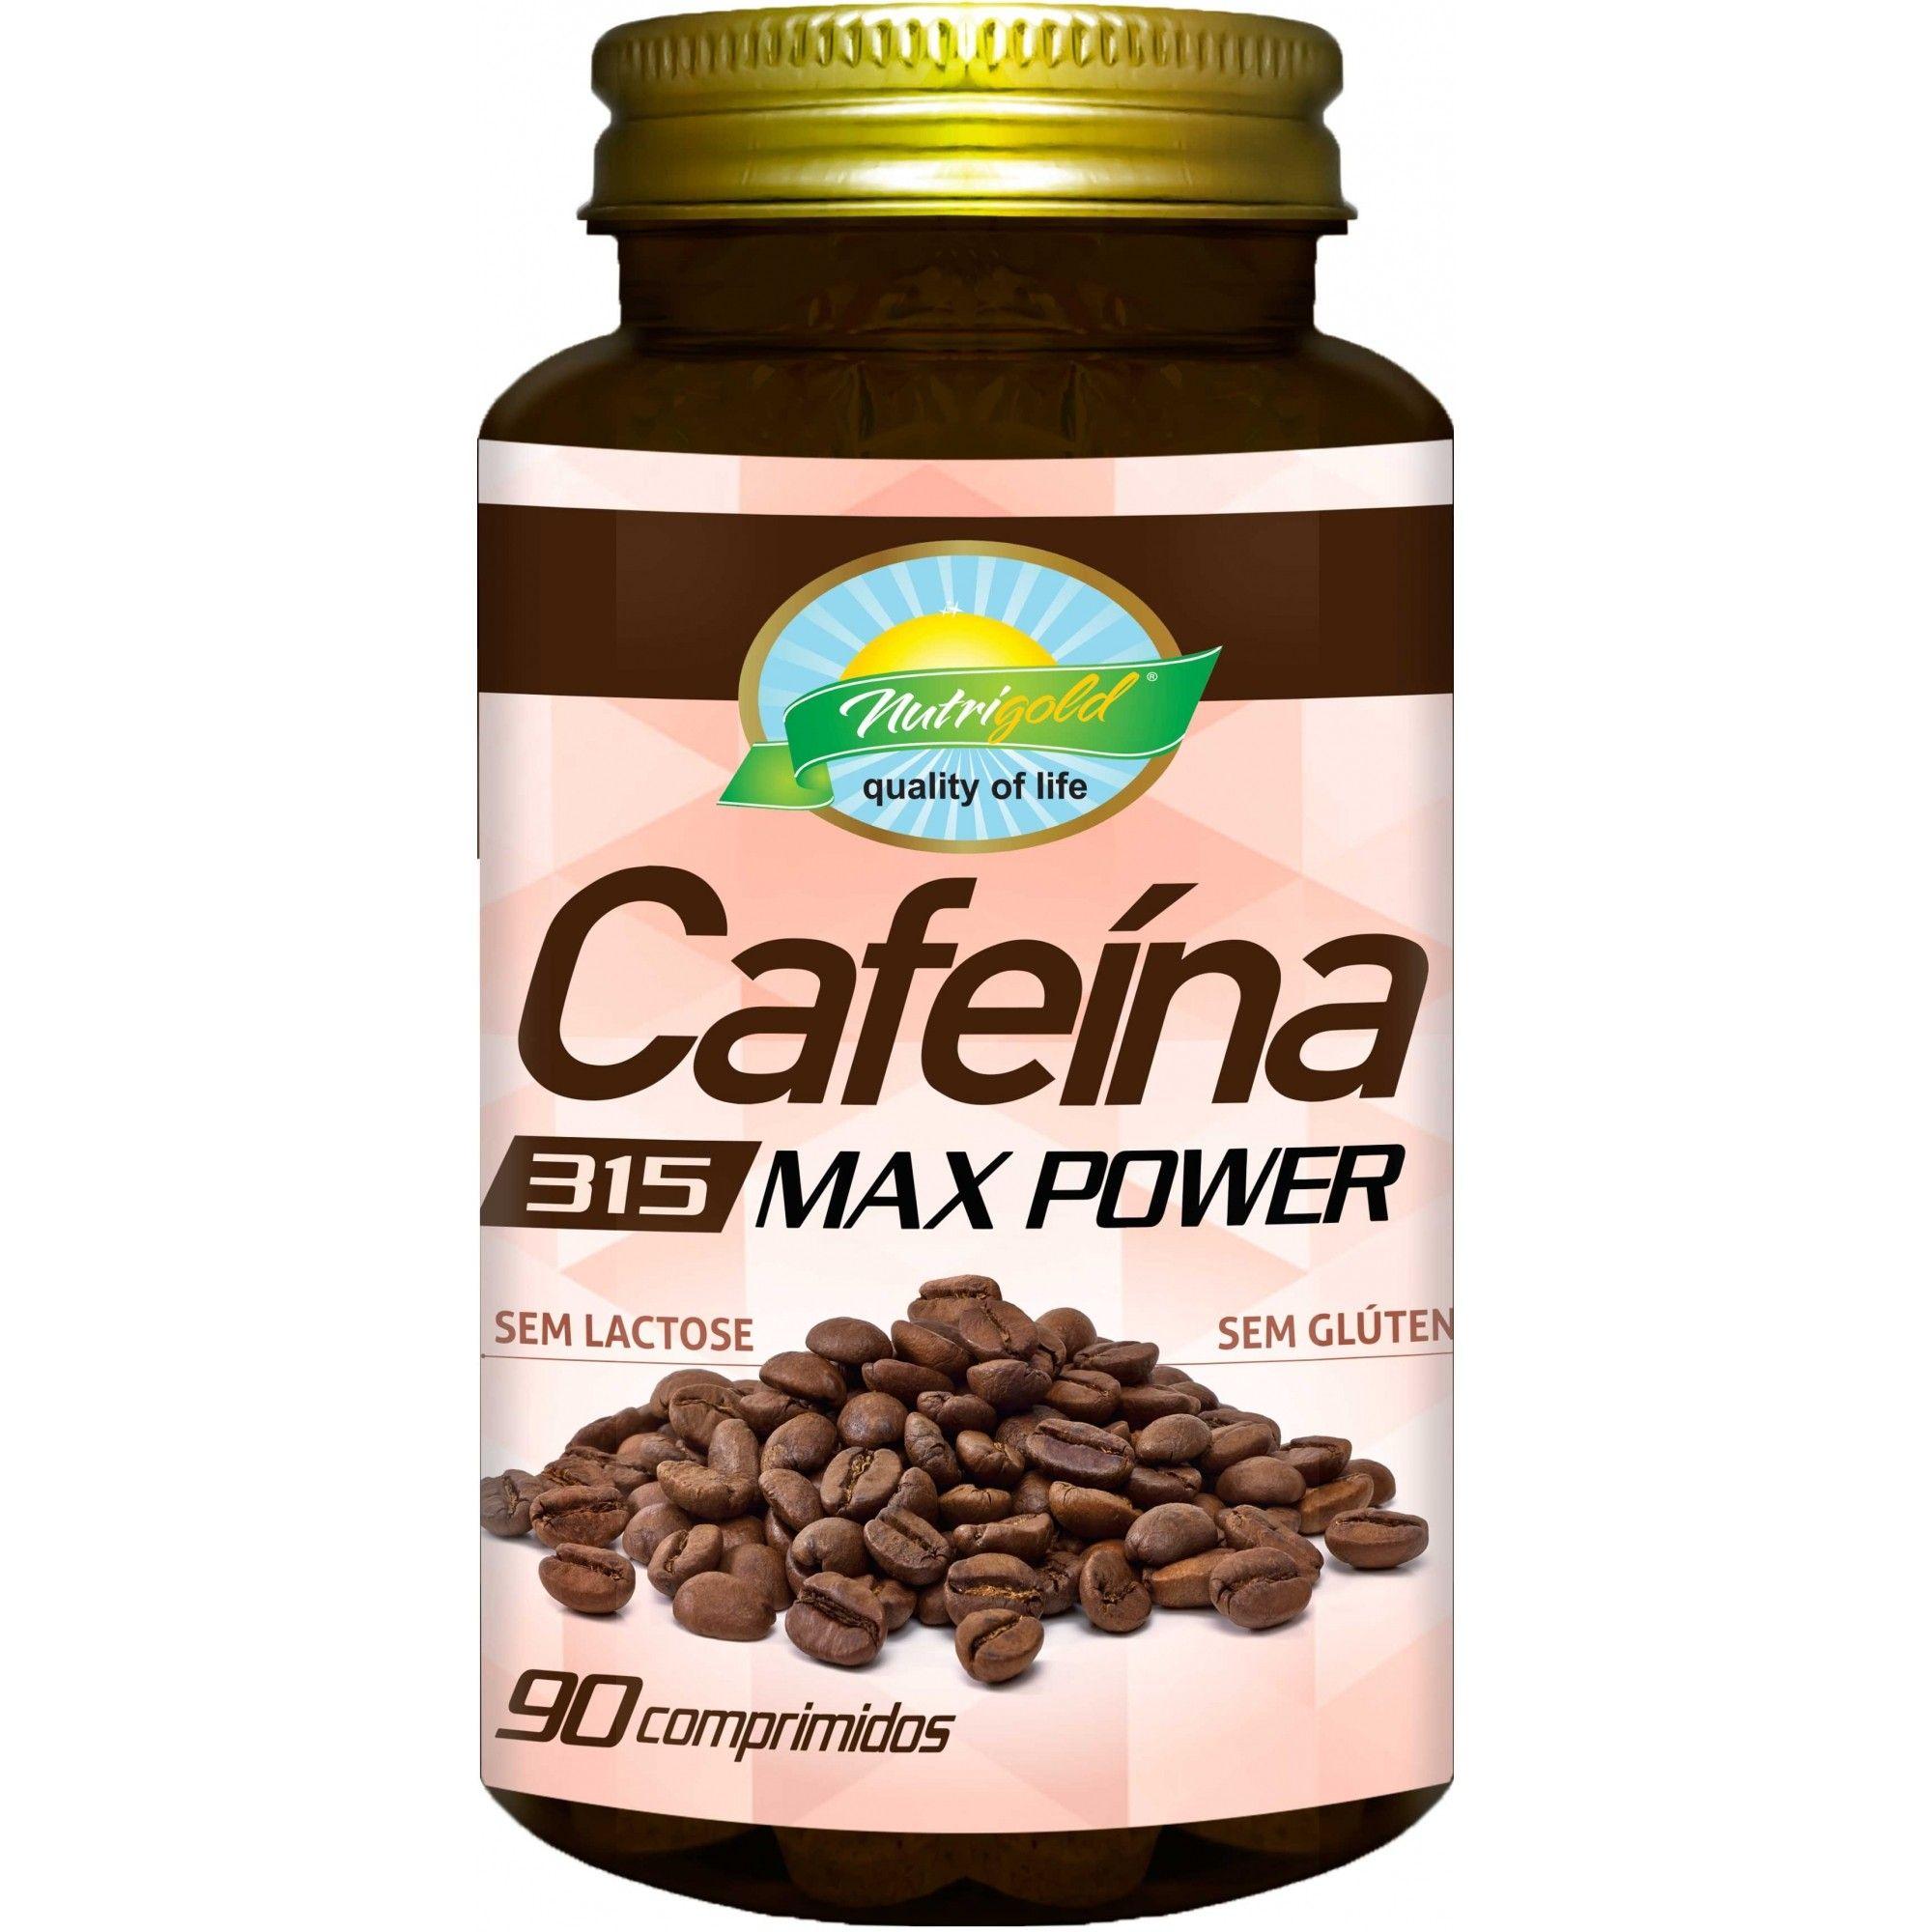 Kit 6 Cafeína 90 Comprimidos 315mg Max Power